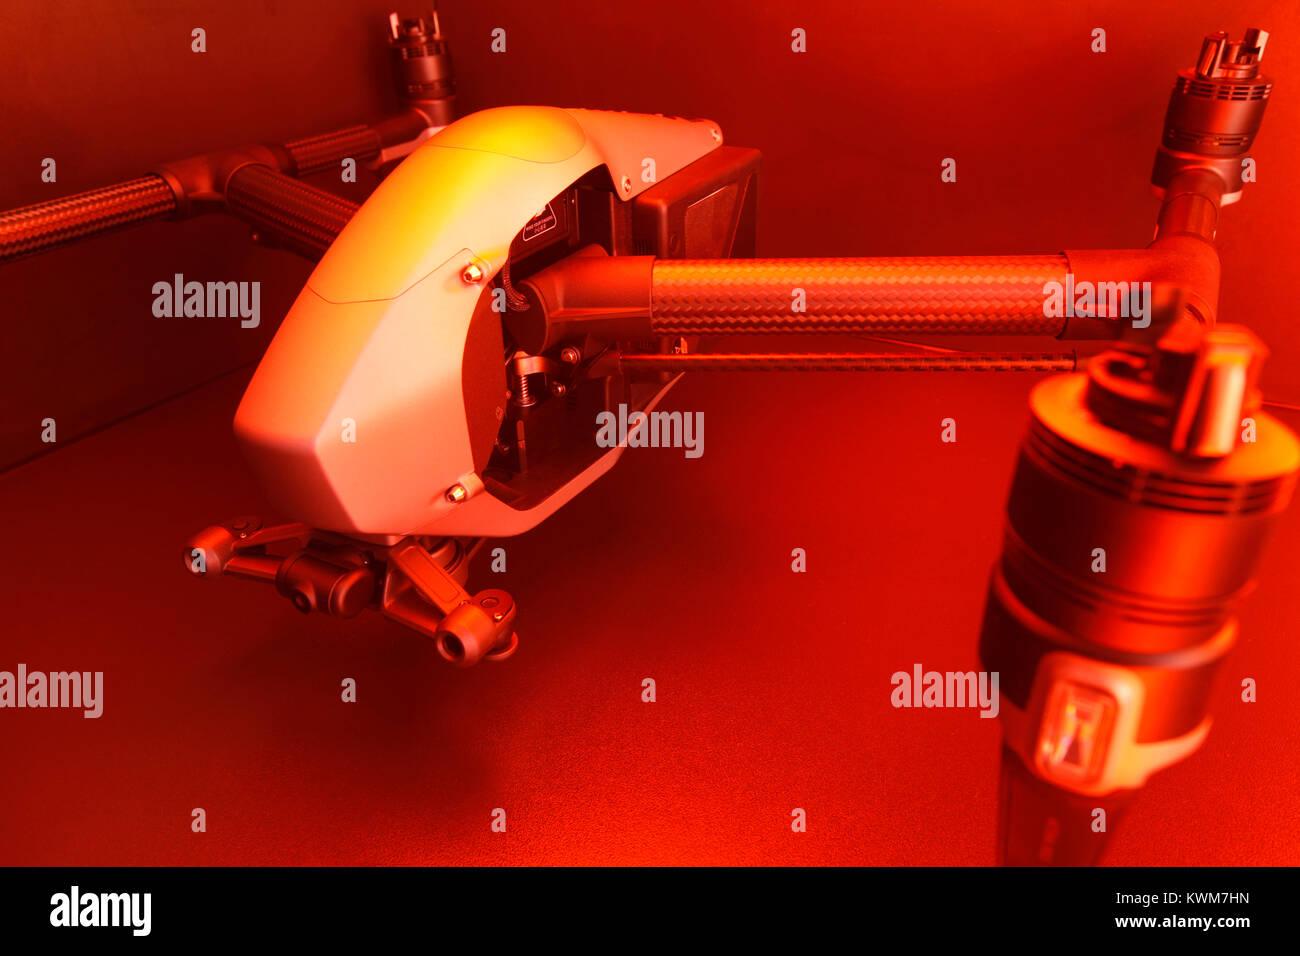 DJI Inspire 2 - Drone, Quadcopter with detachable 4K gimbal - Stock Image